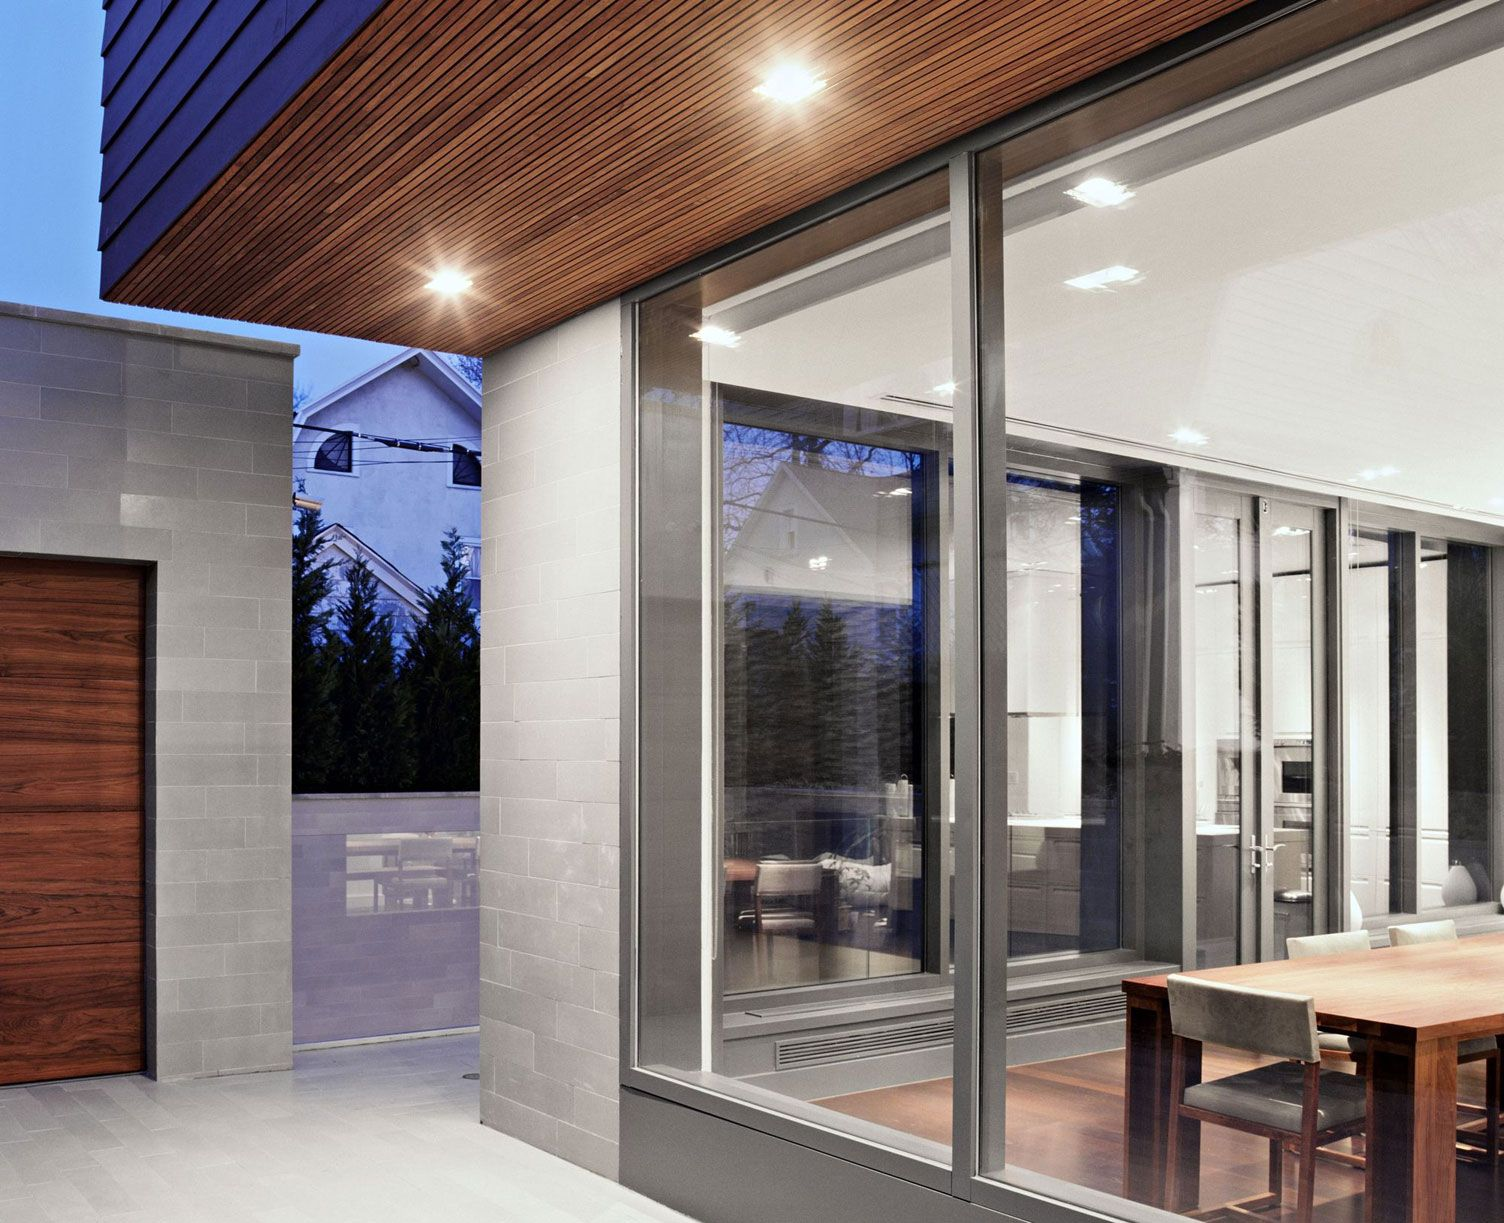 House wooden window design  bayside house by grzywinski pons   architecture u design